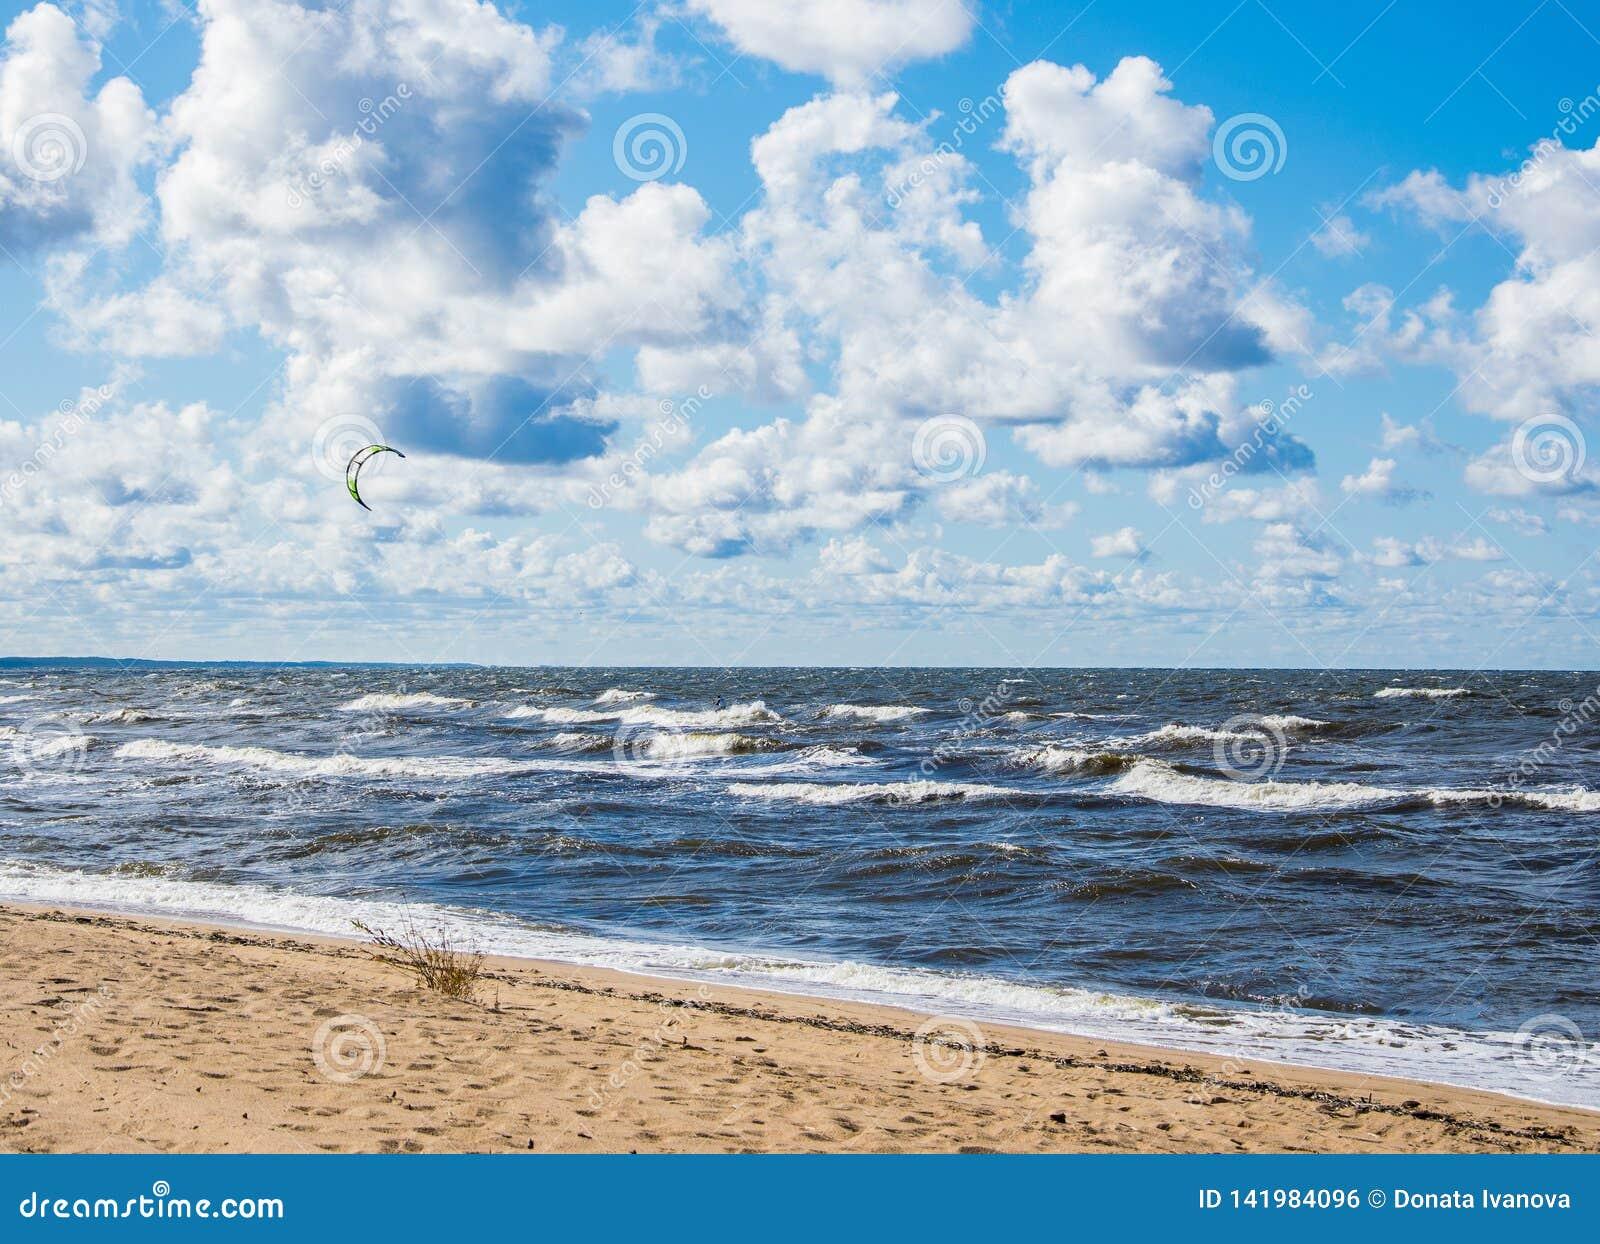 Kitesurfing Kiteboarding行动照片 在波浪中的Kitesurfer迅速去